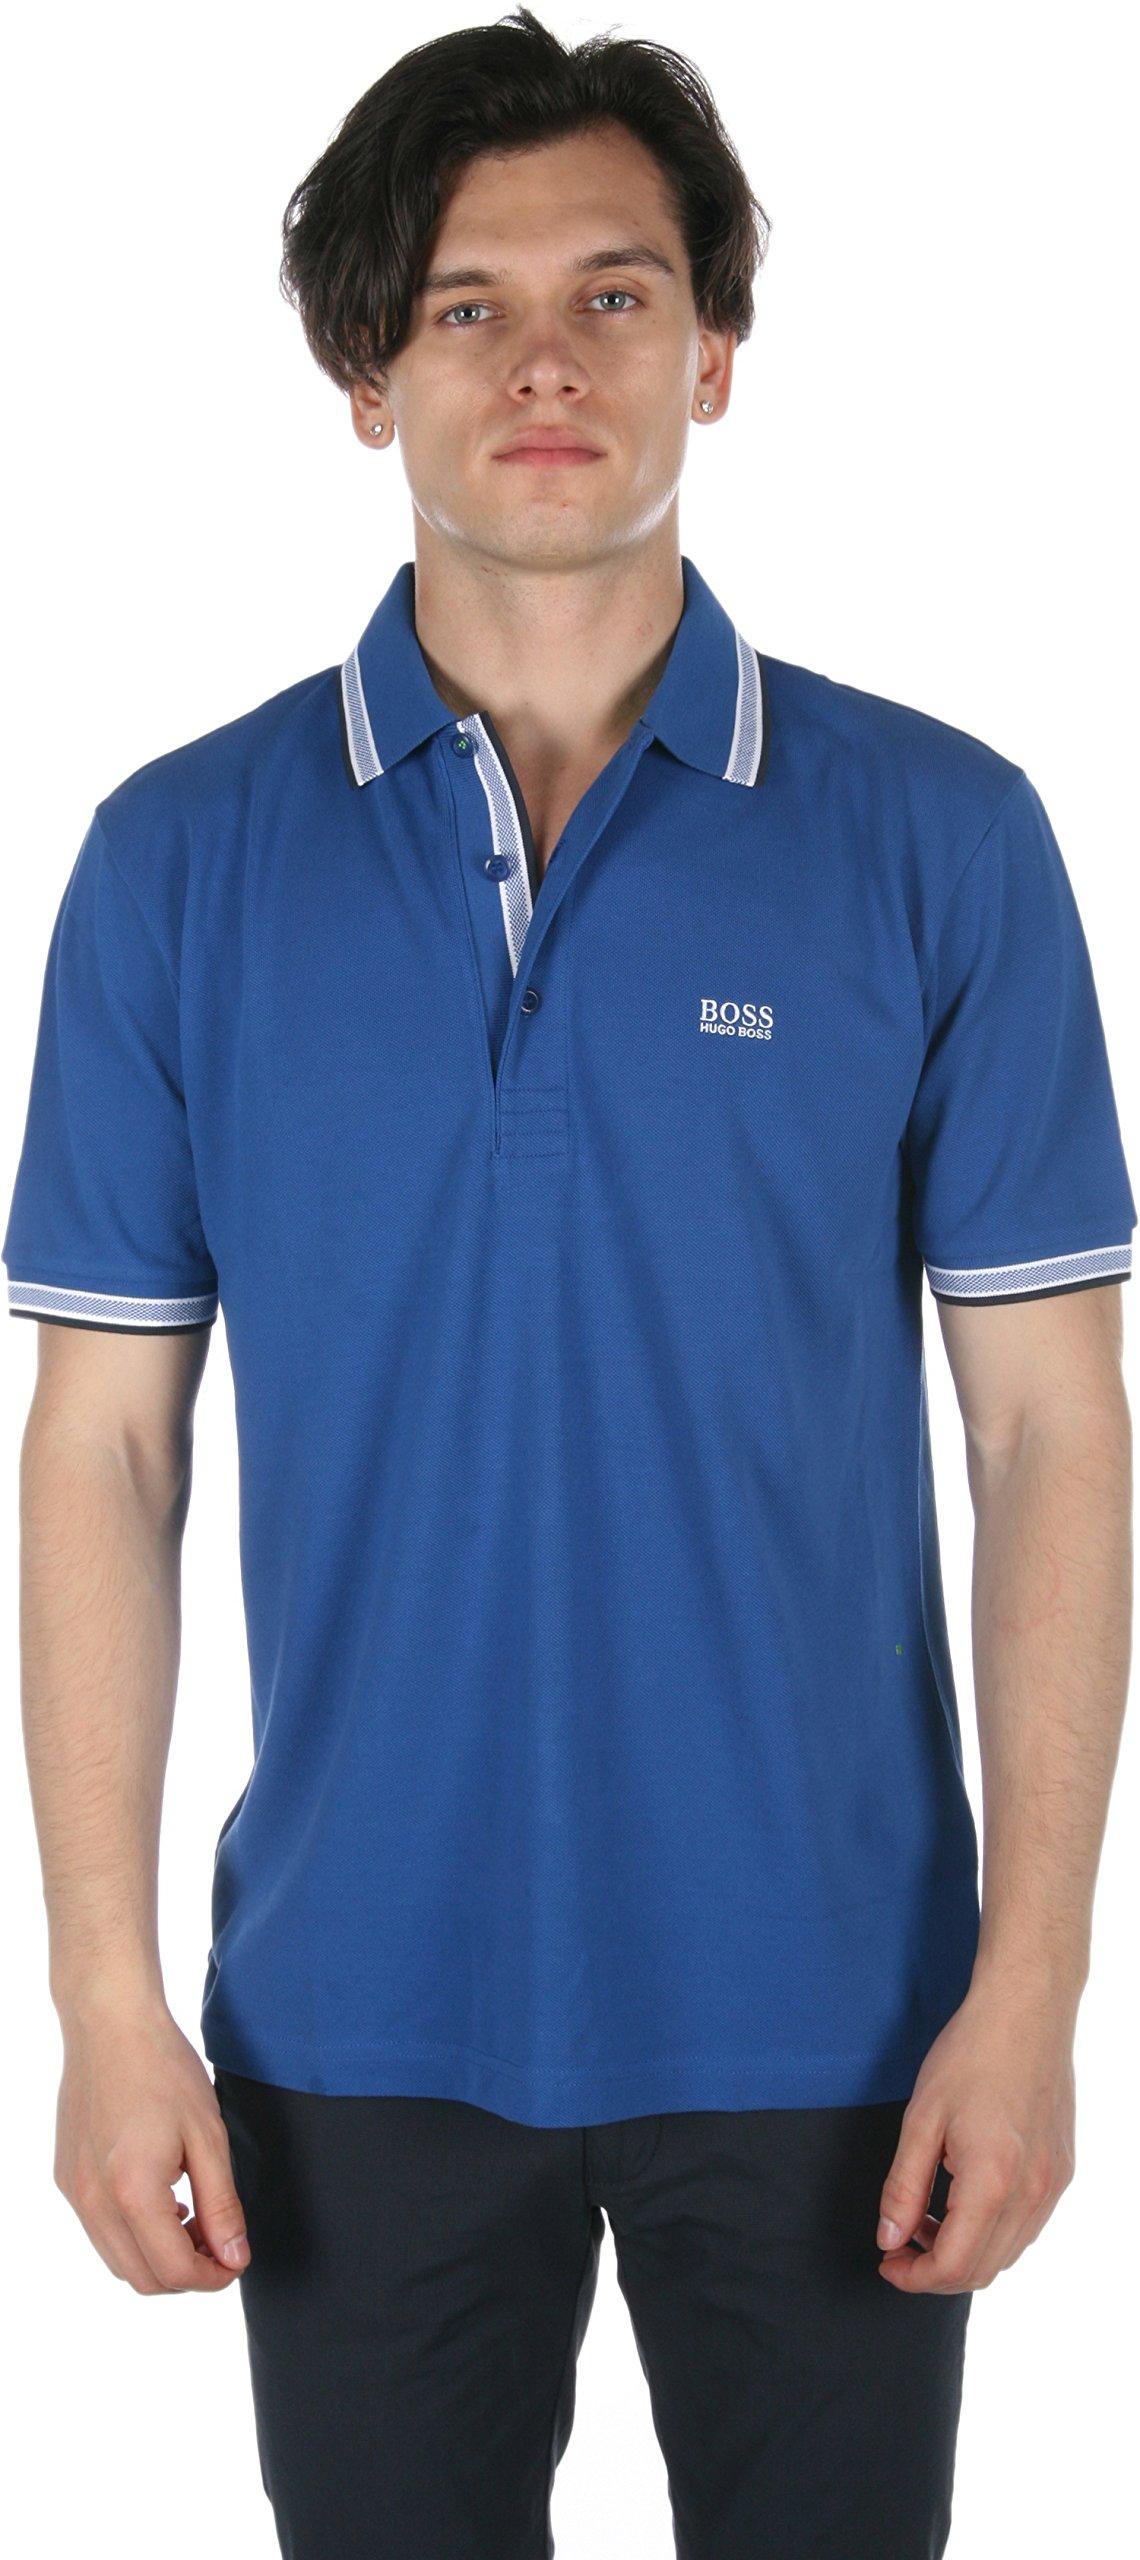 Hugo Boss Boss Green Men's Paddy Polo 10102943 True Blue Polo Shirt 3XL